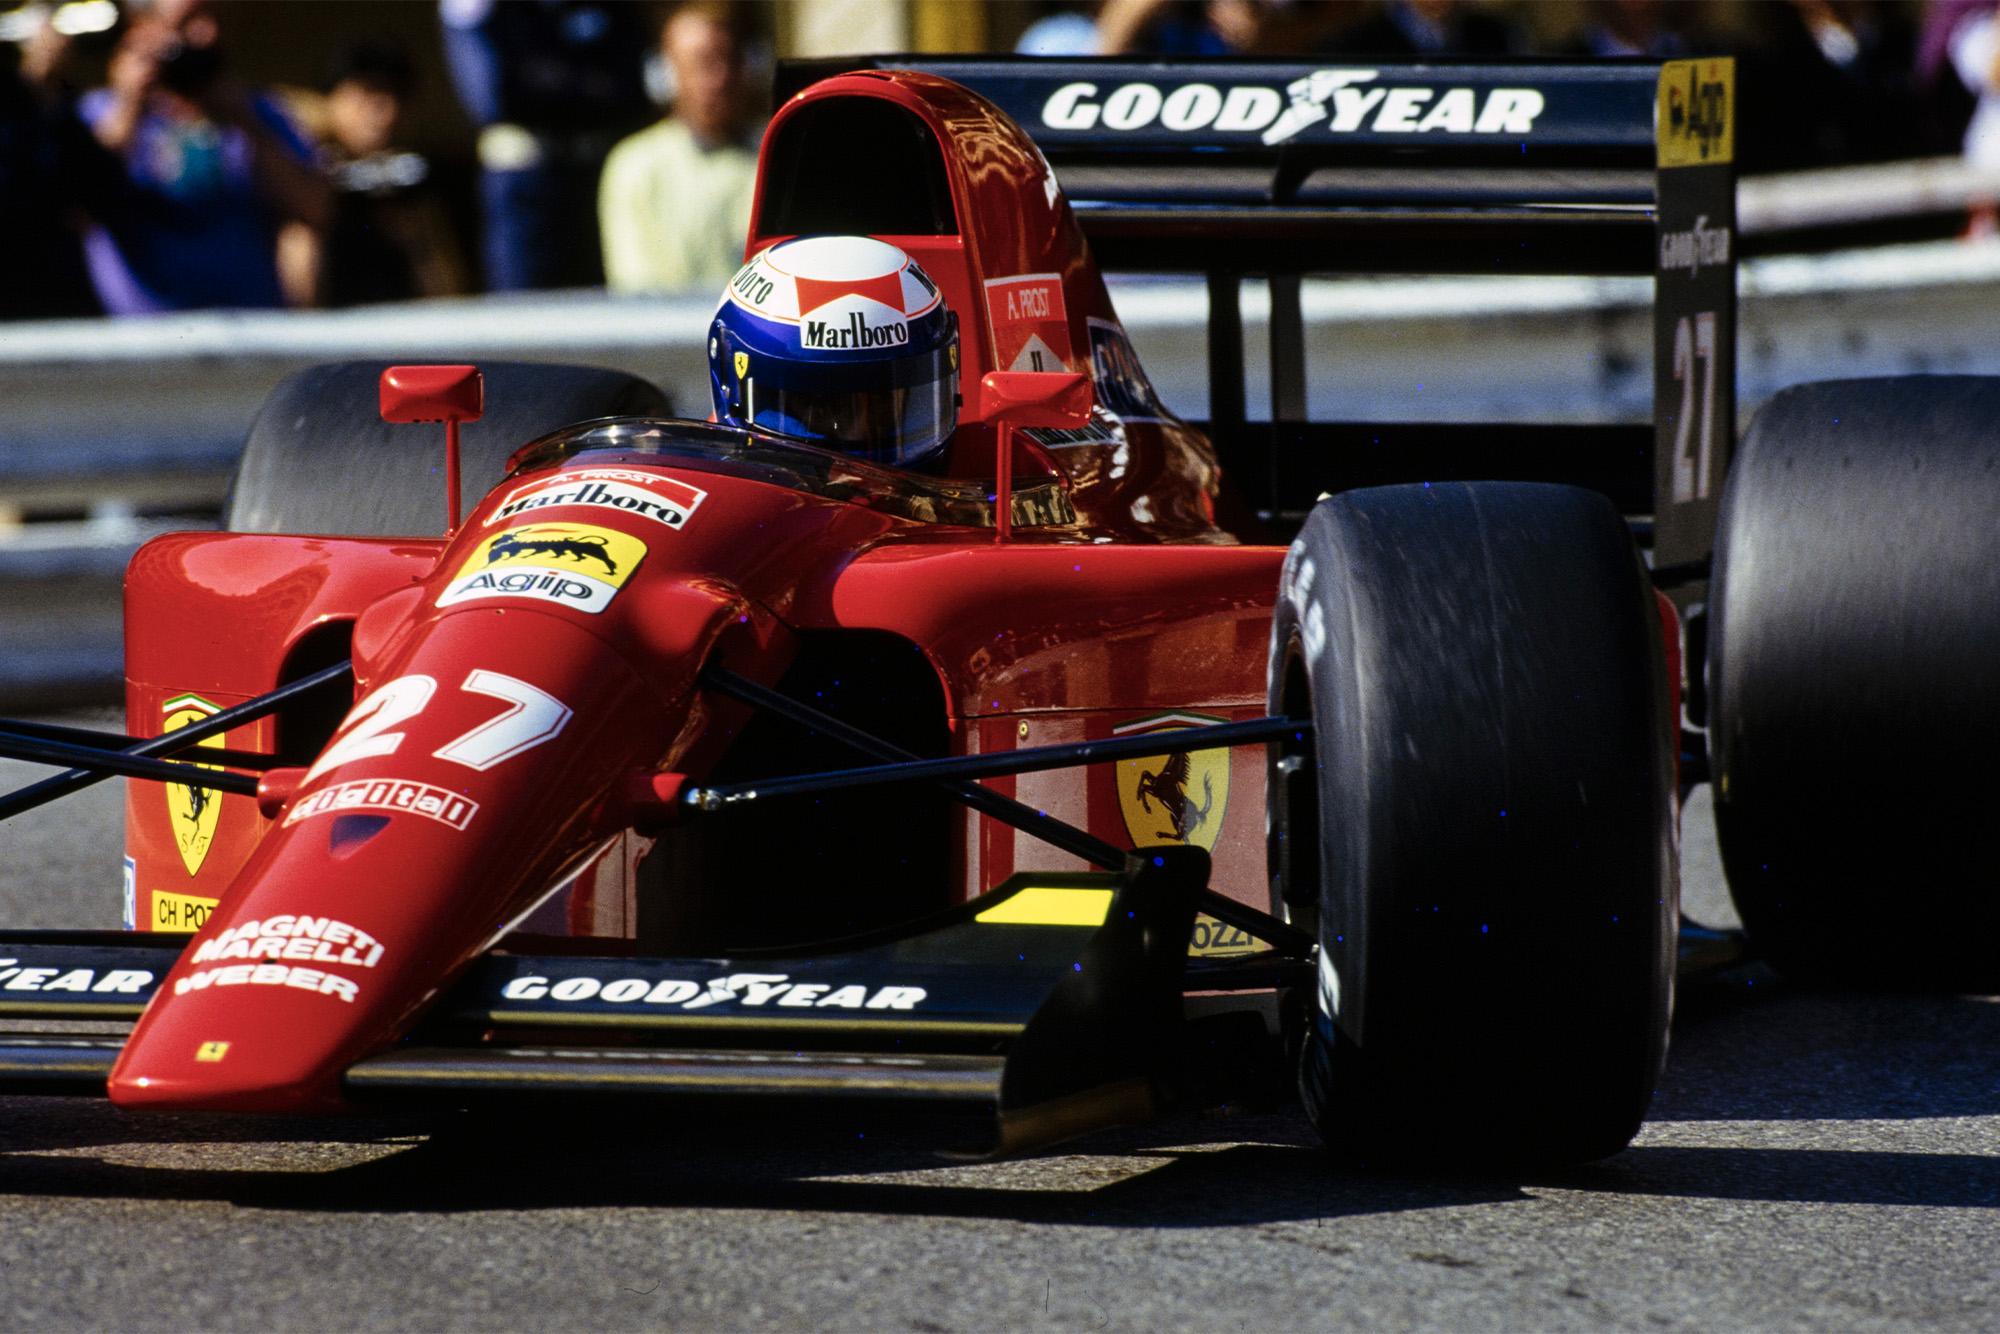 Alain Prost in the Ferrari